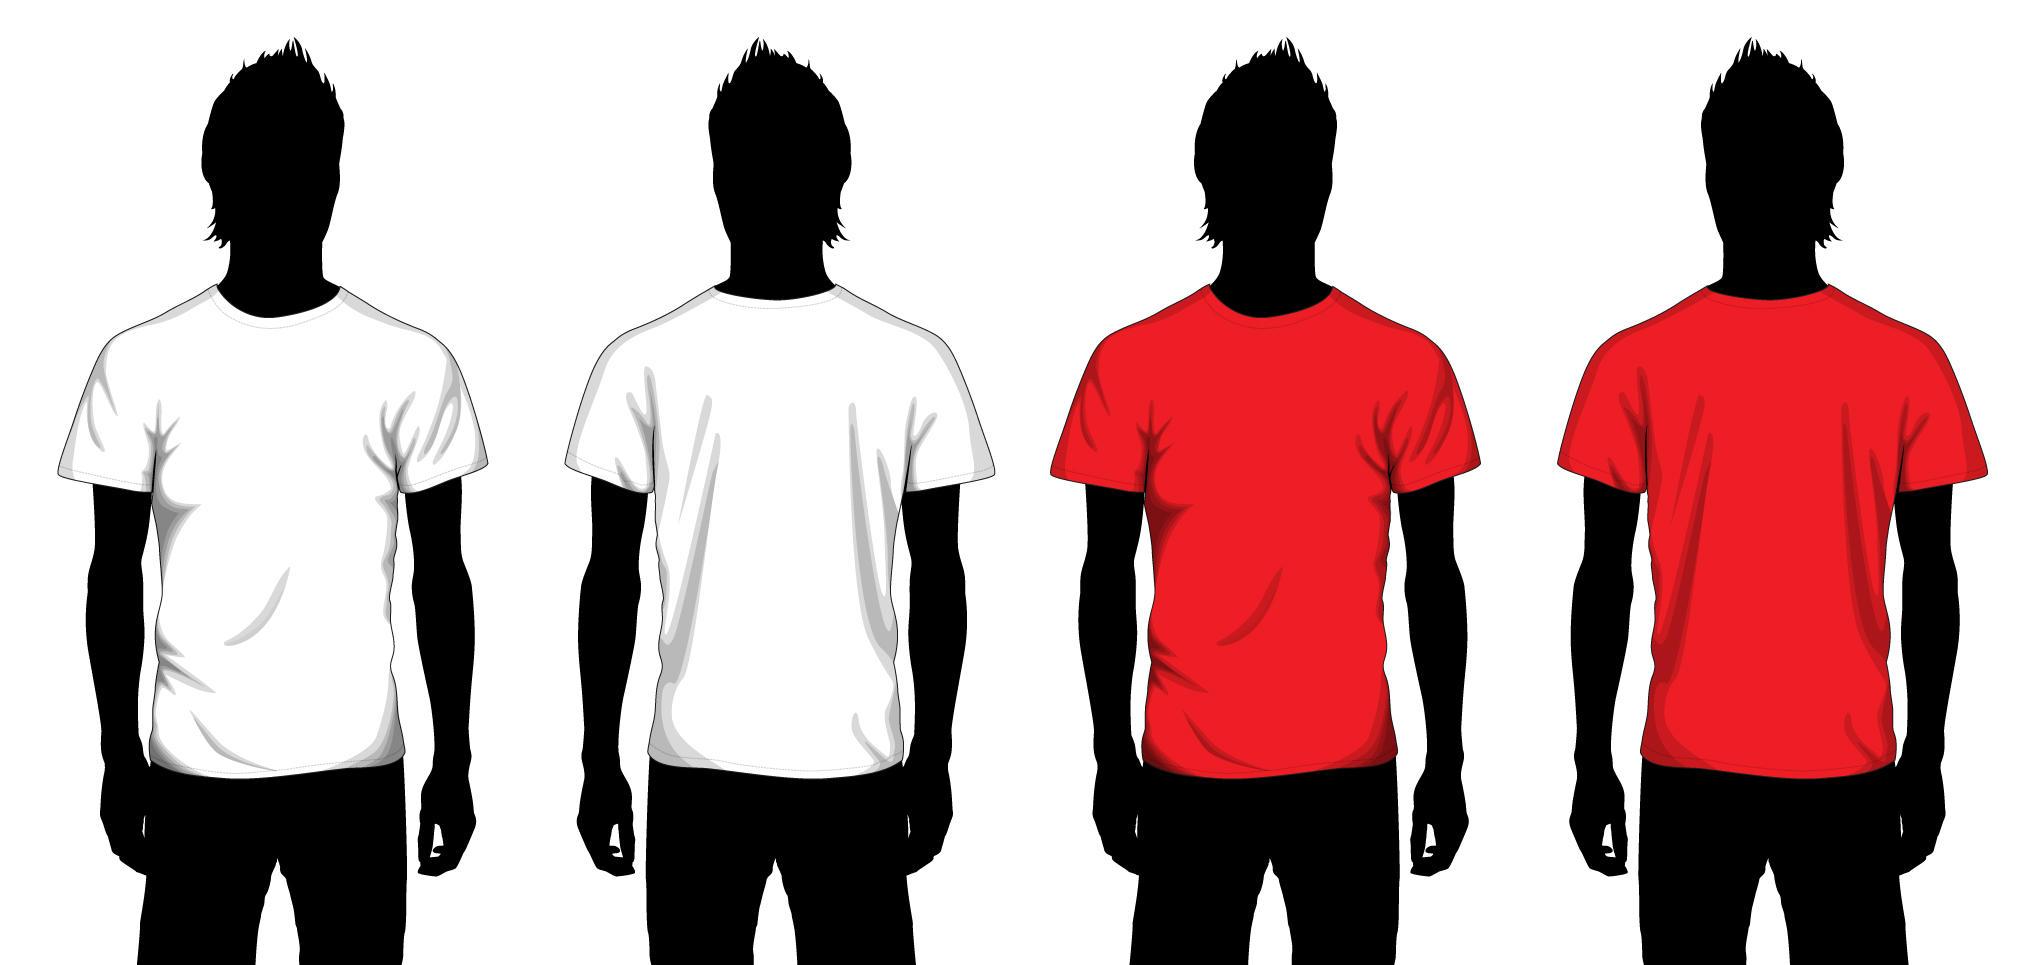 Vector T-shirt Template by JovDaRipper on DeviantArt